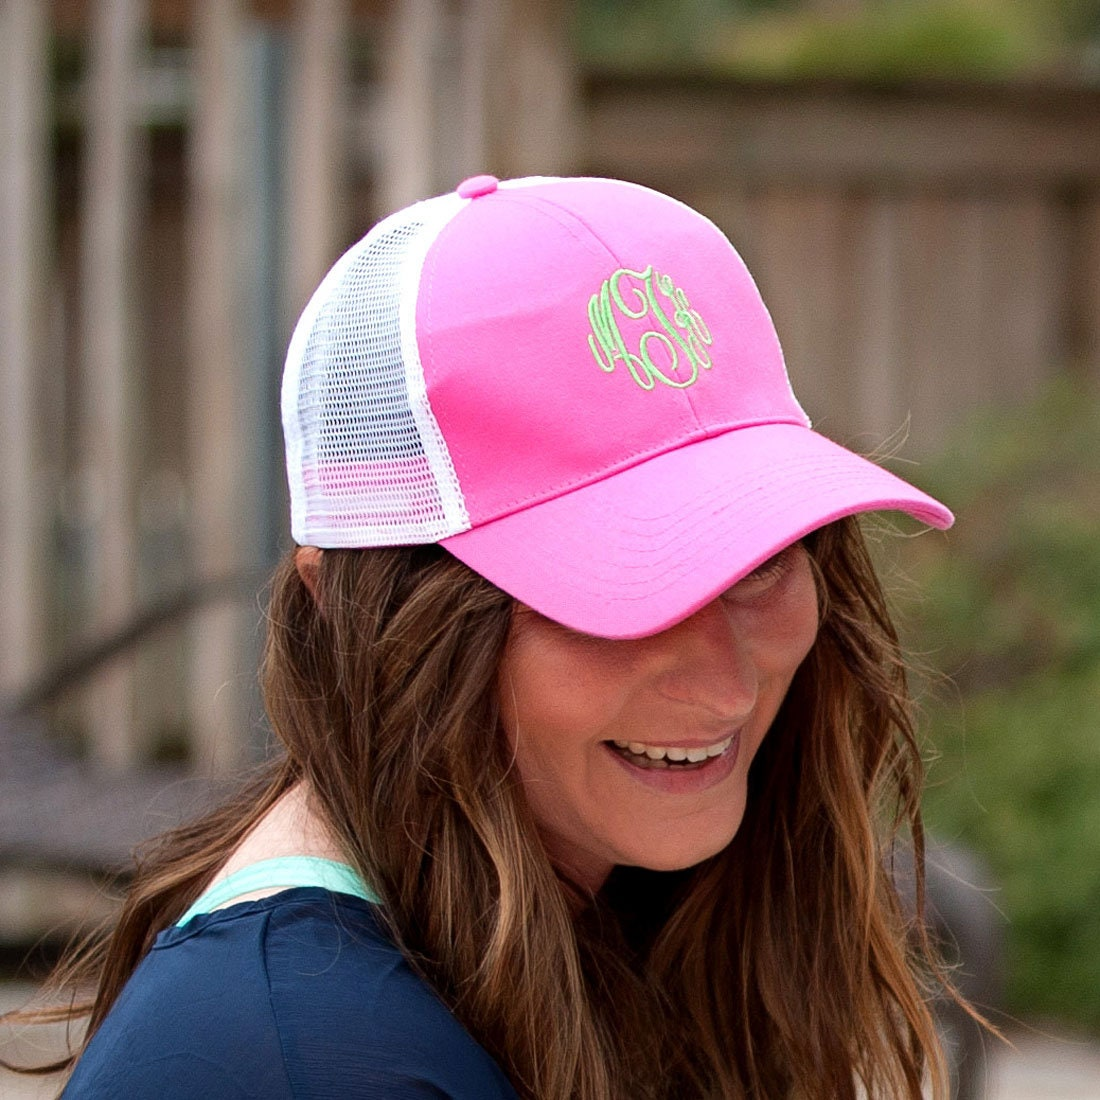 91ad3c8a9f1b3 Monogram Hot Pink Trucker Cap for Women